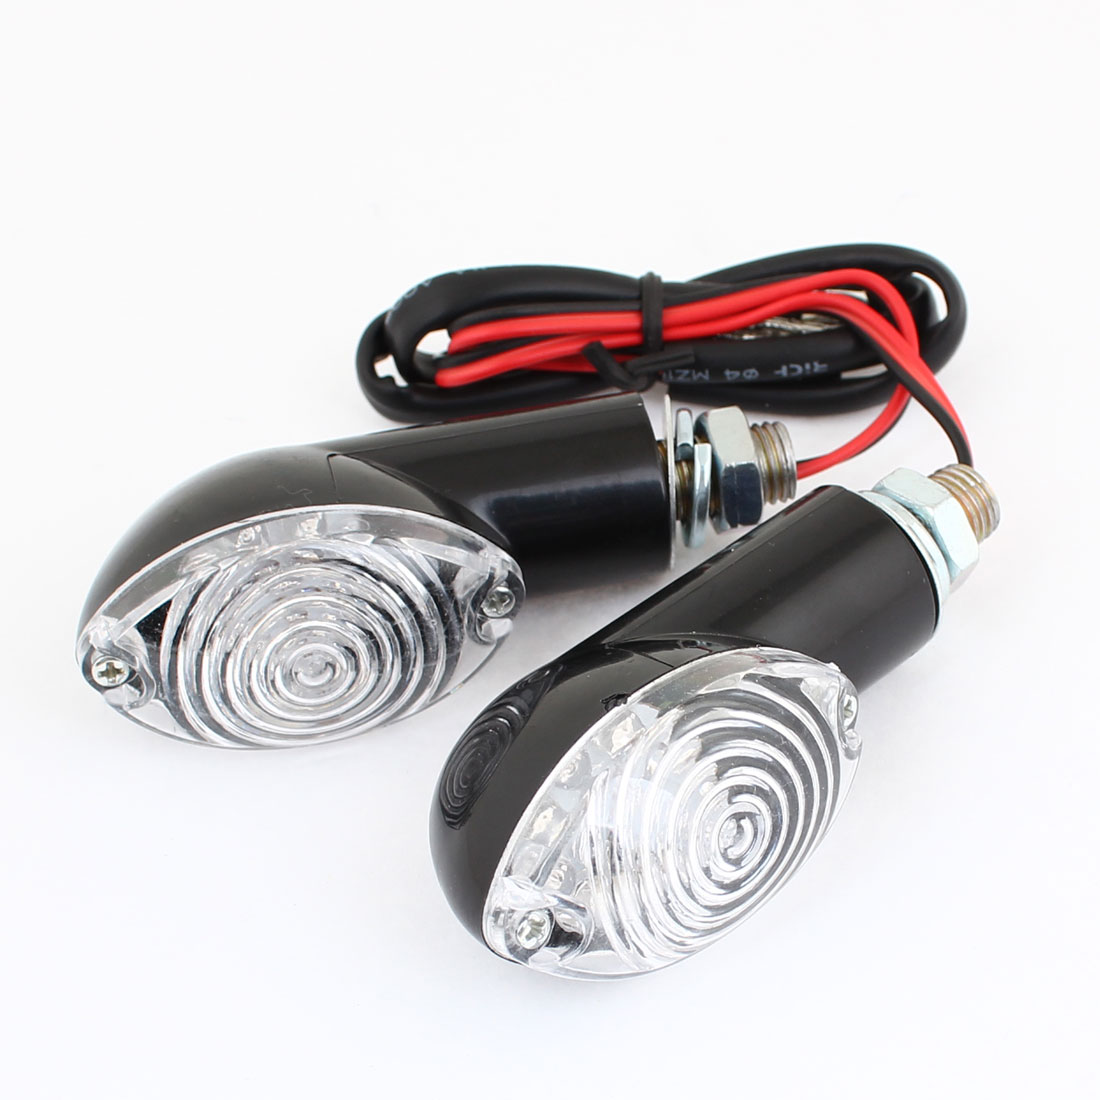 2PCS Yellow 12 LED Universal Turn Signal Light Indicator Lamps for Motorcycle